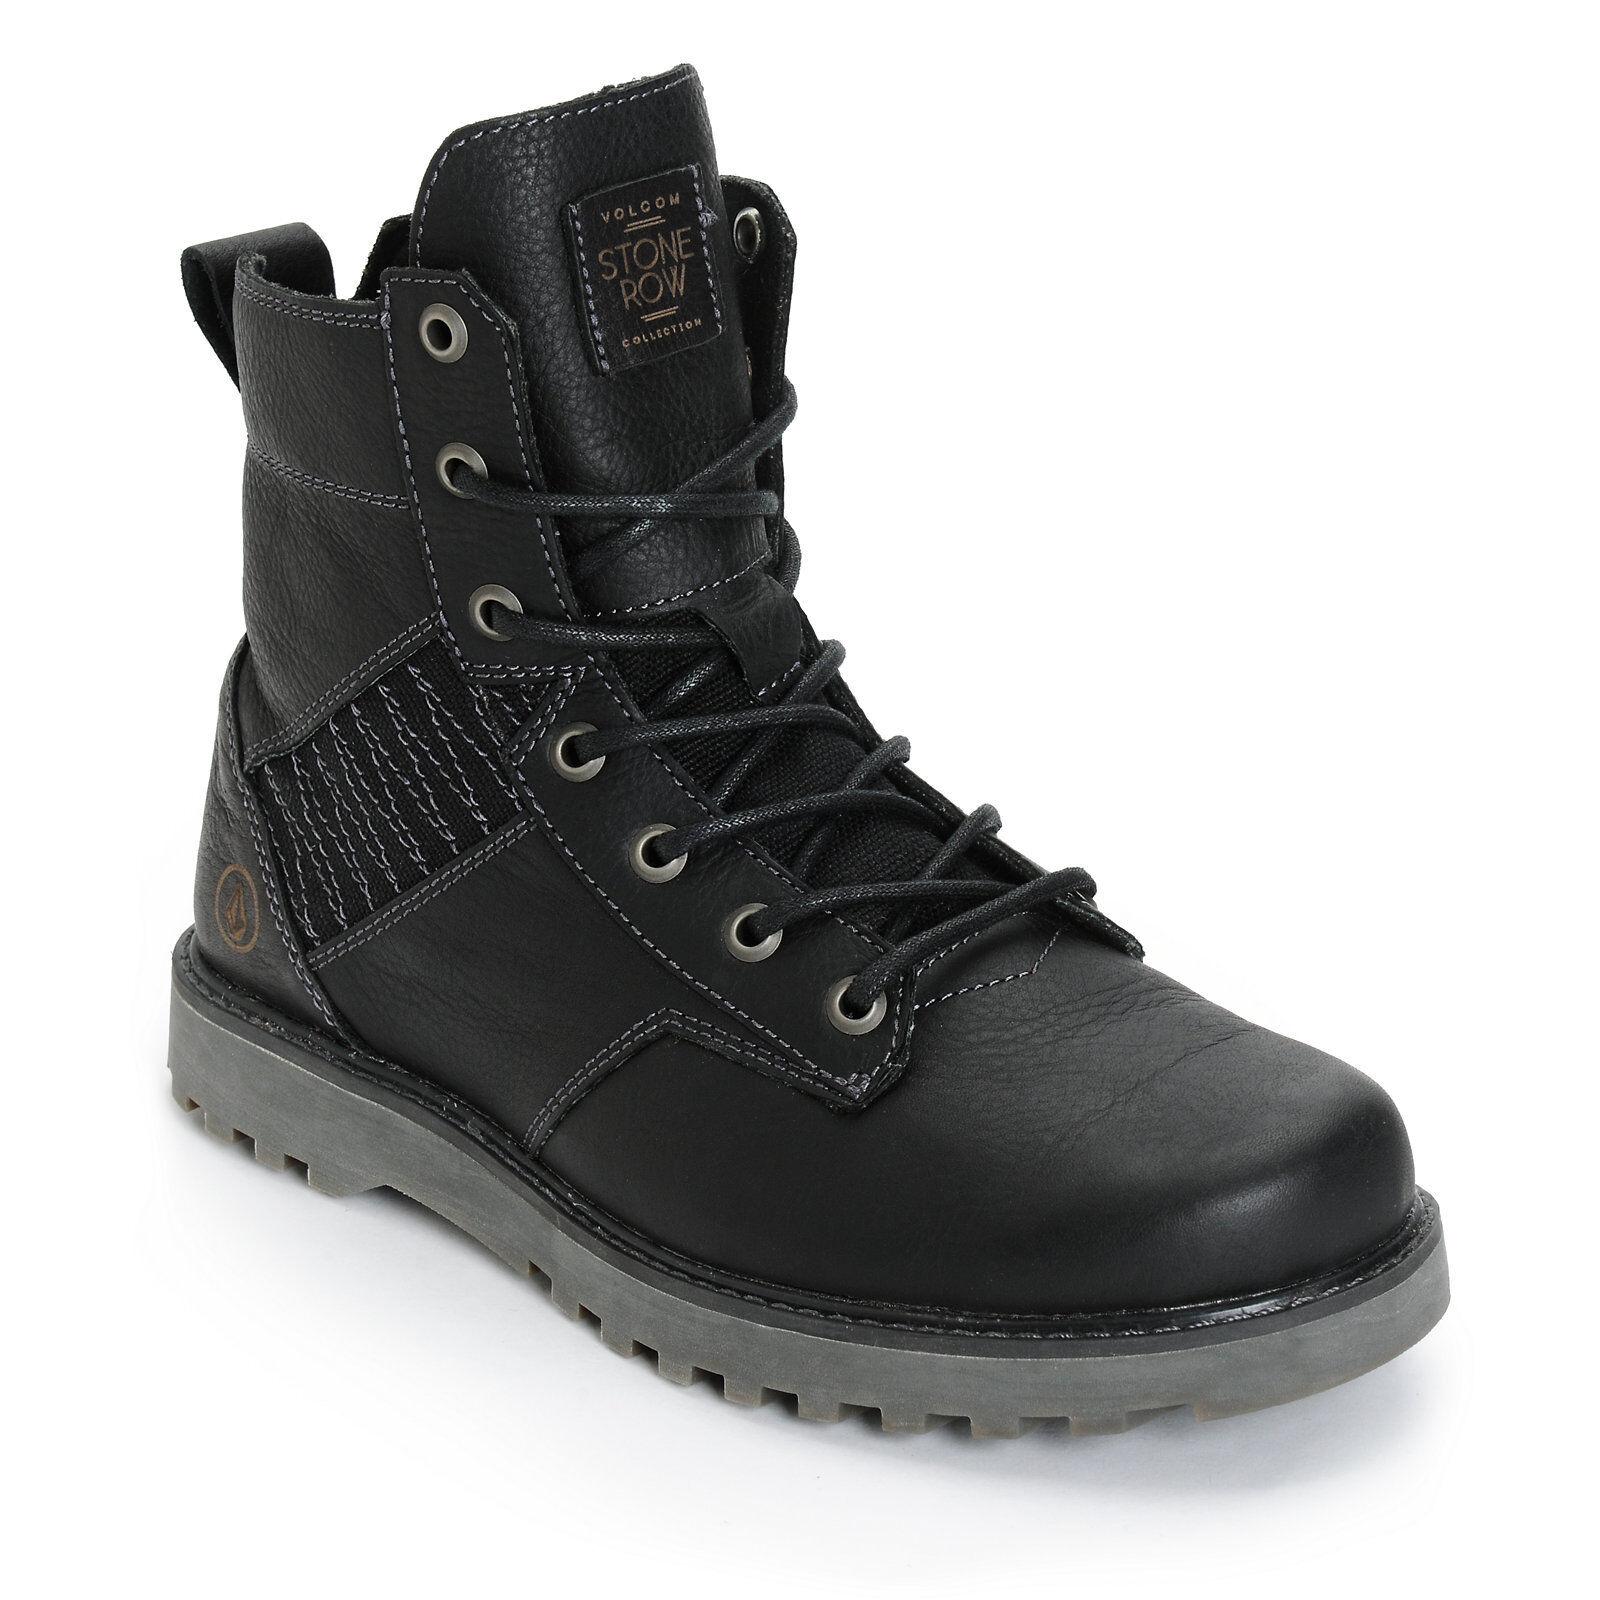 Volcom Hemlock Women's Leather  Leather Women's Boots  NIB d8d85f